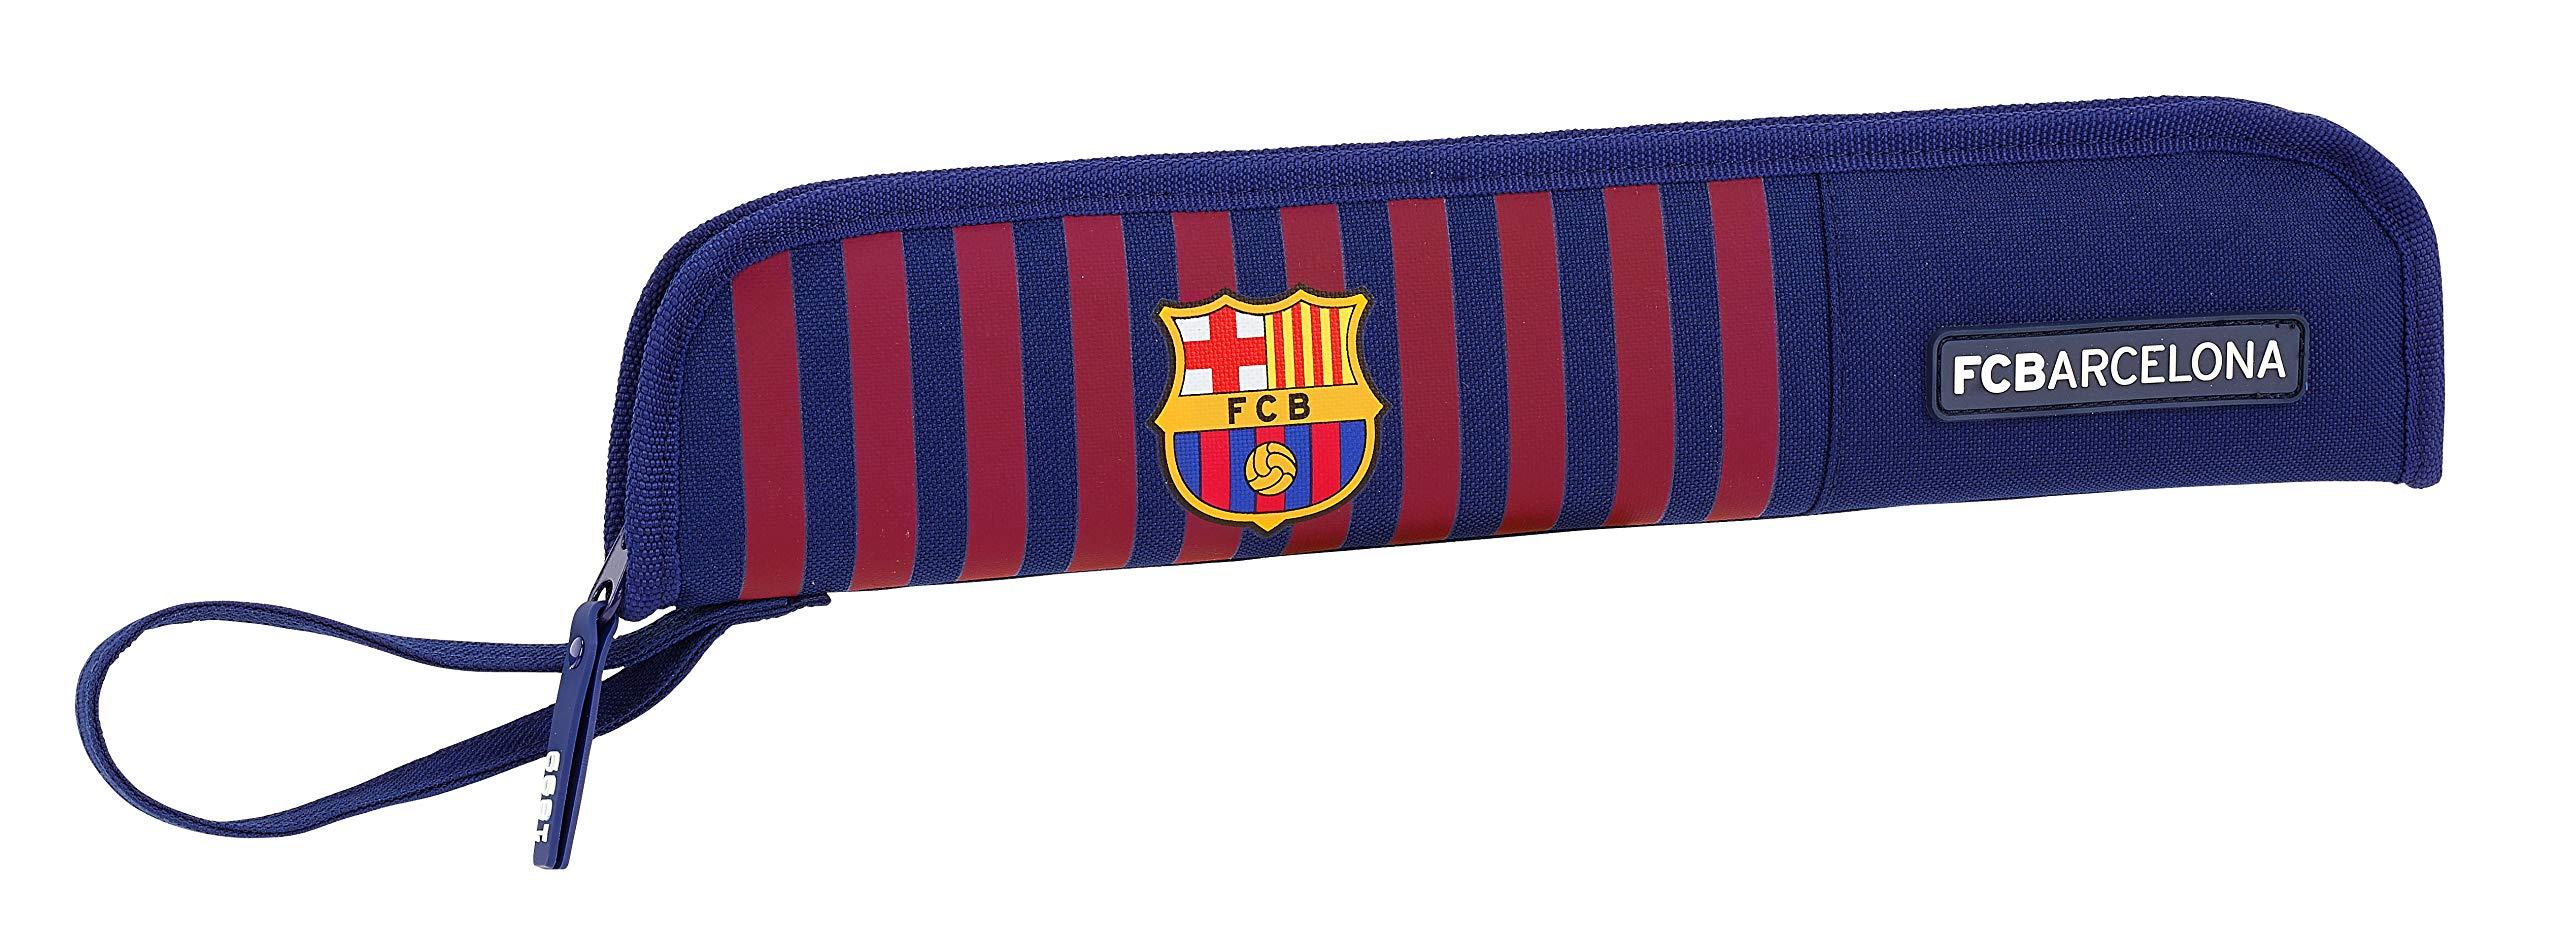 FC Barcelona 811829284 2018 Estuches, 37 cm, Azul